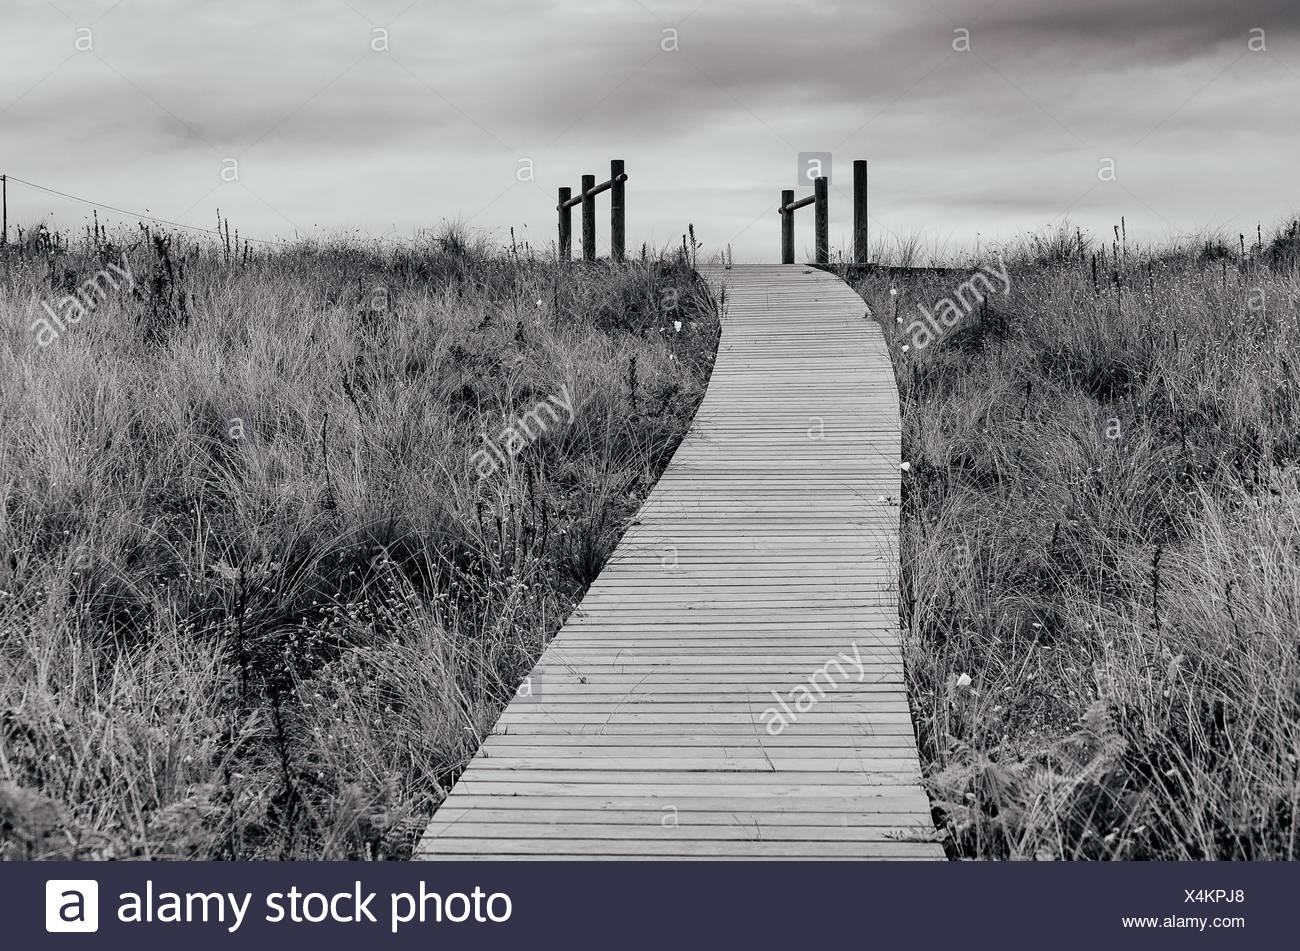 Boardwalk through grass area - Stock Image